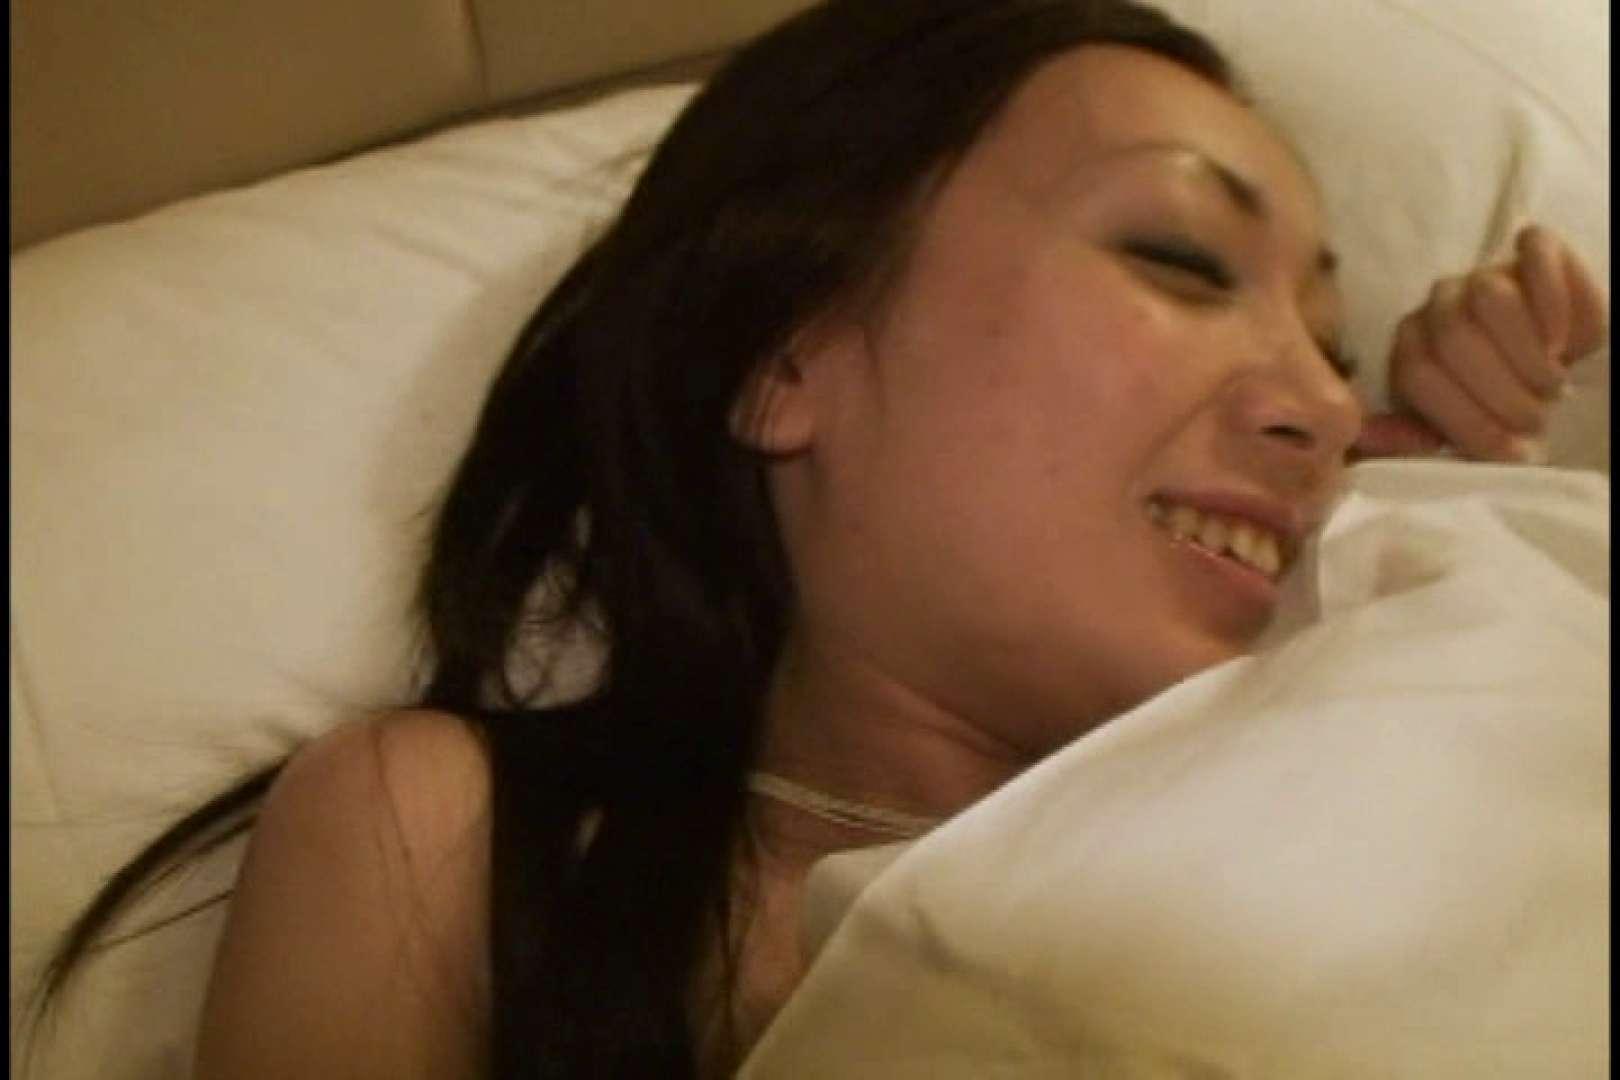 JDハンター全国ツアー vol.044 後編 いやらしい女子大生 オマンコ動画キャプチャ 23連発 2